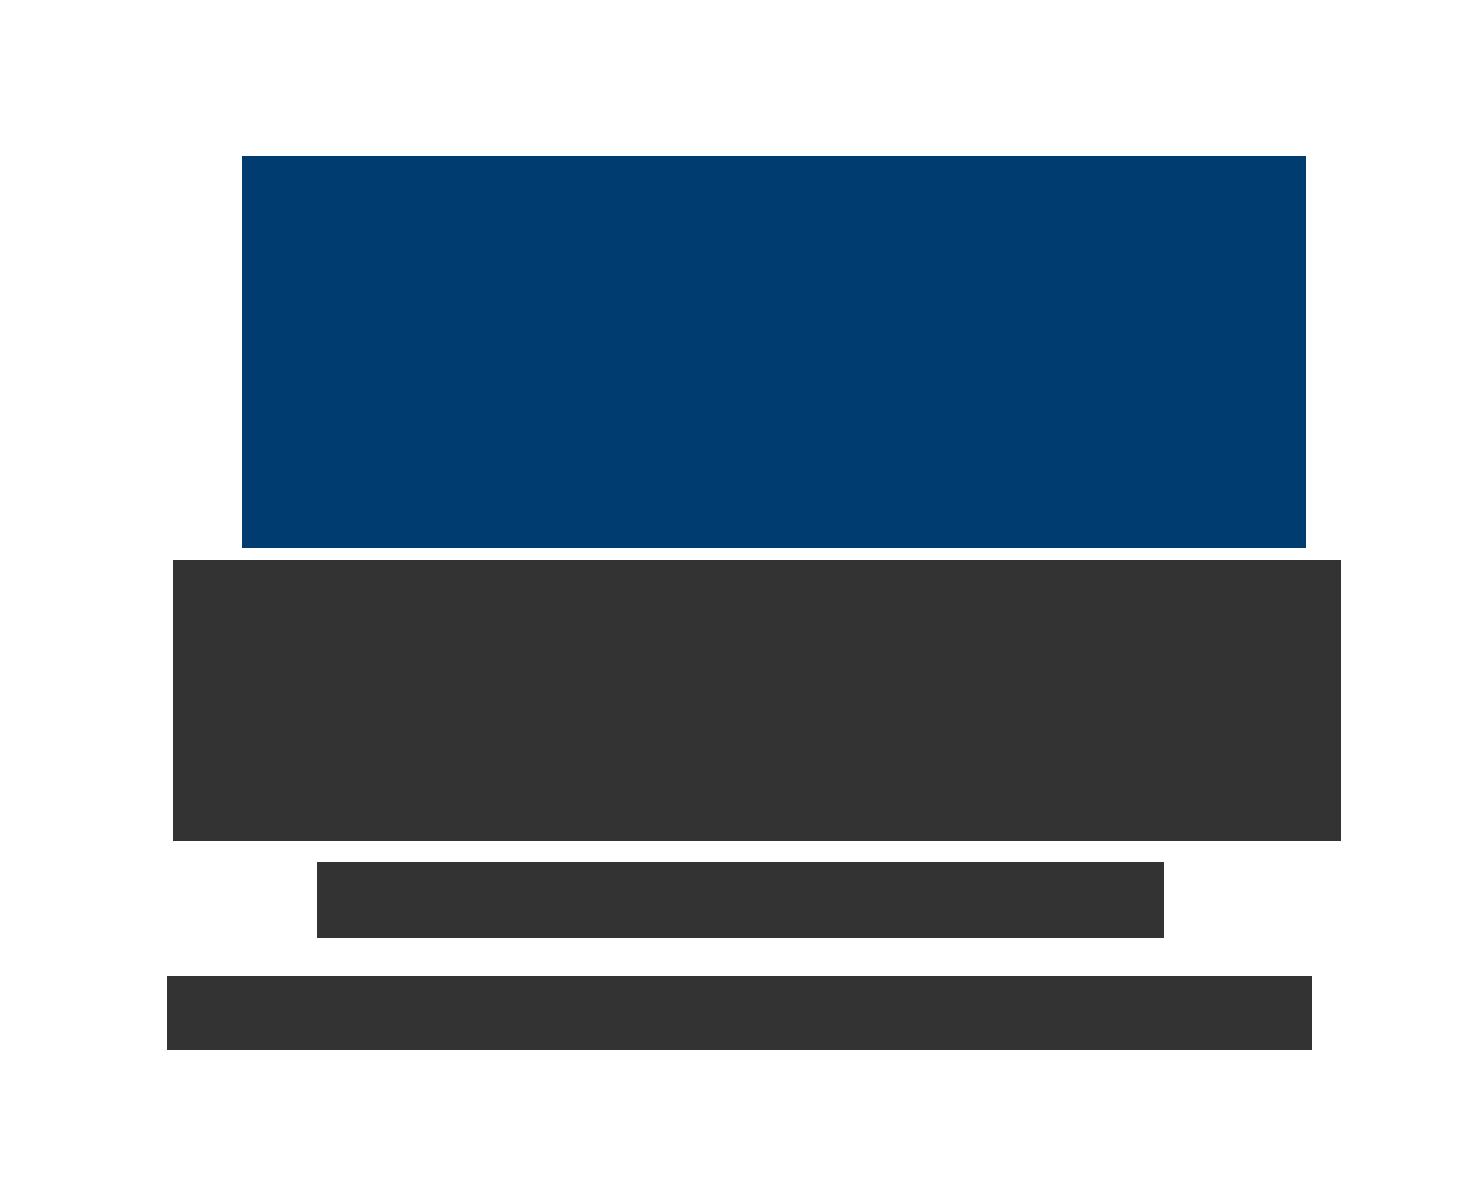 Taylor Kia Of Boardman >> Cbc Automotive Advertising Becomes Agency For Taylor Kia Of Boardman